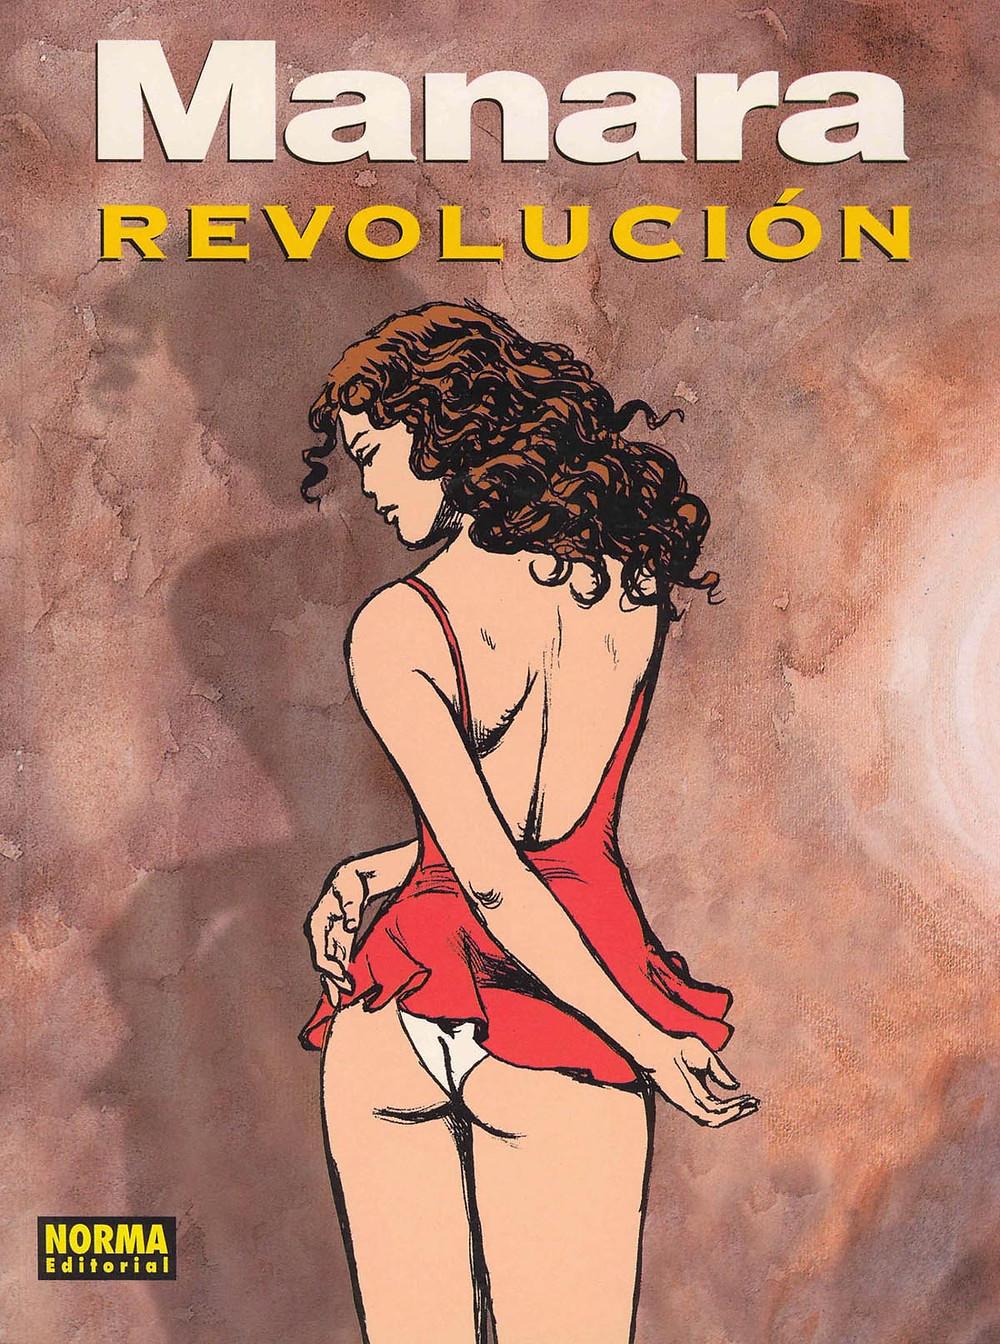 "Комикс ""Революция"". Маурилио Манара. Эротический комикс."